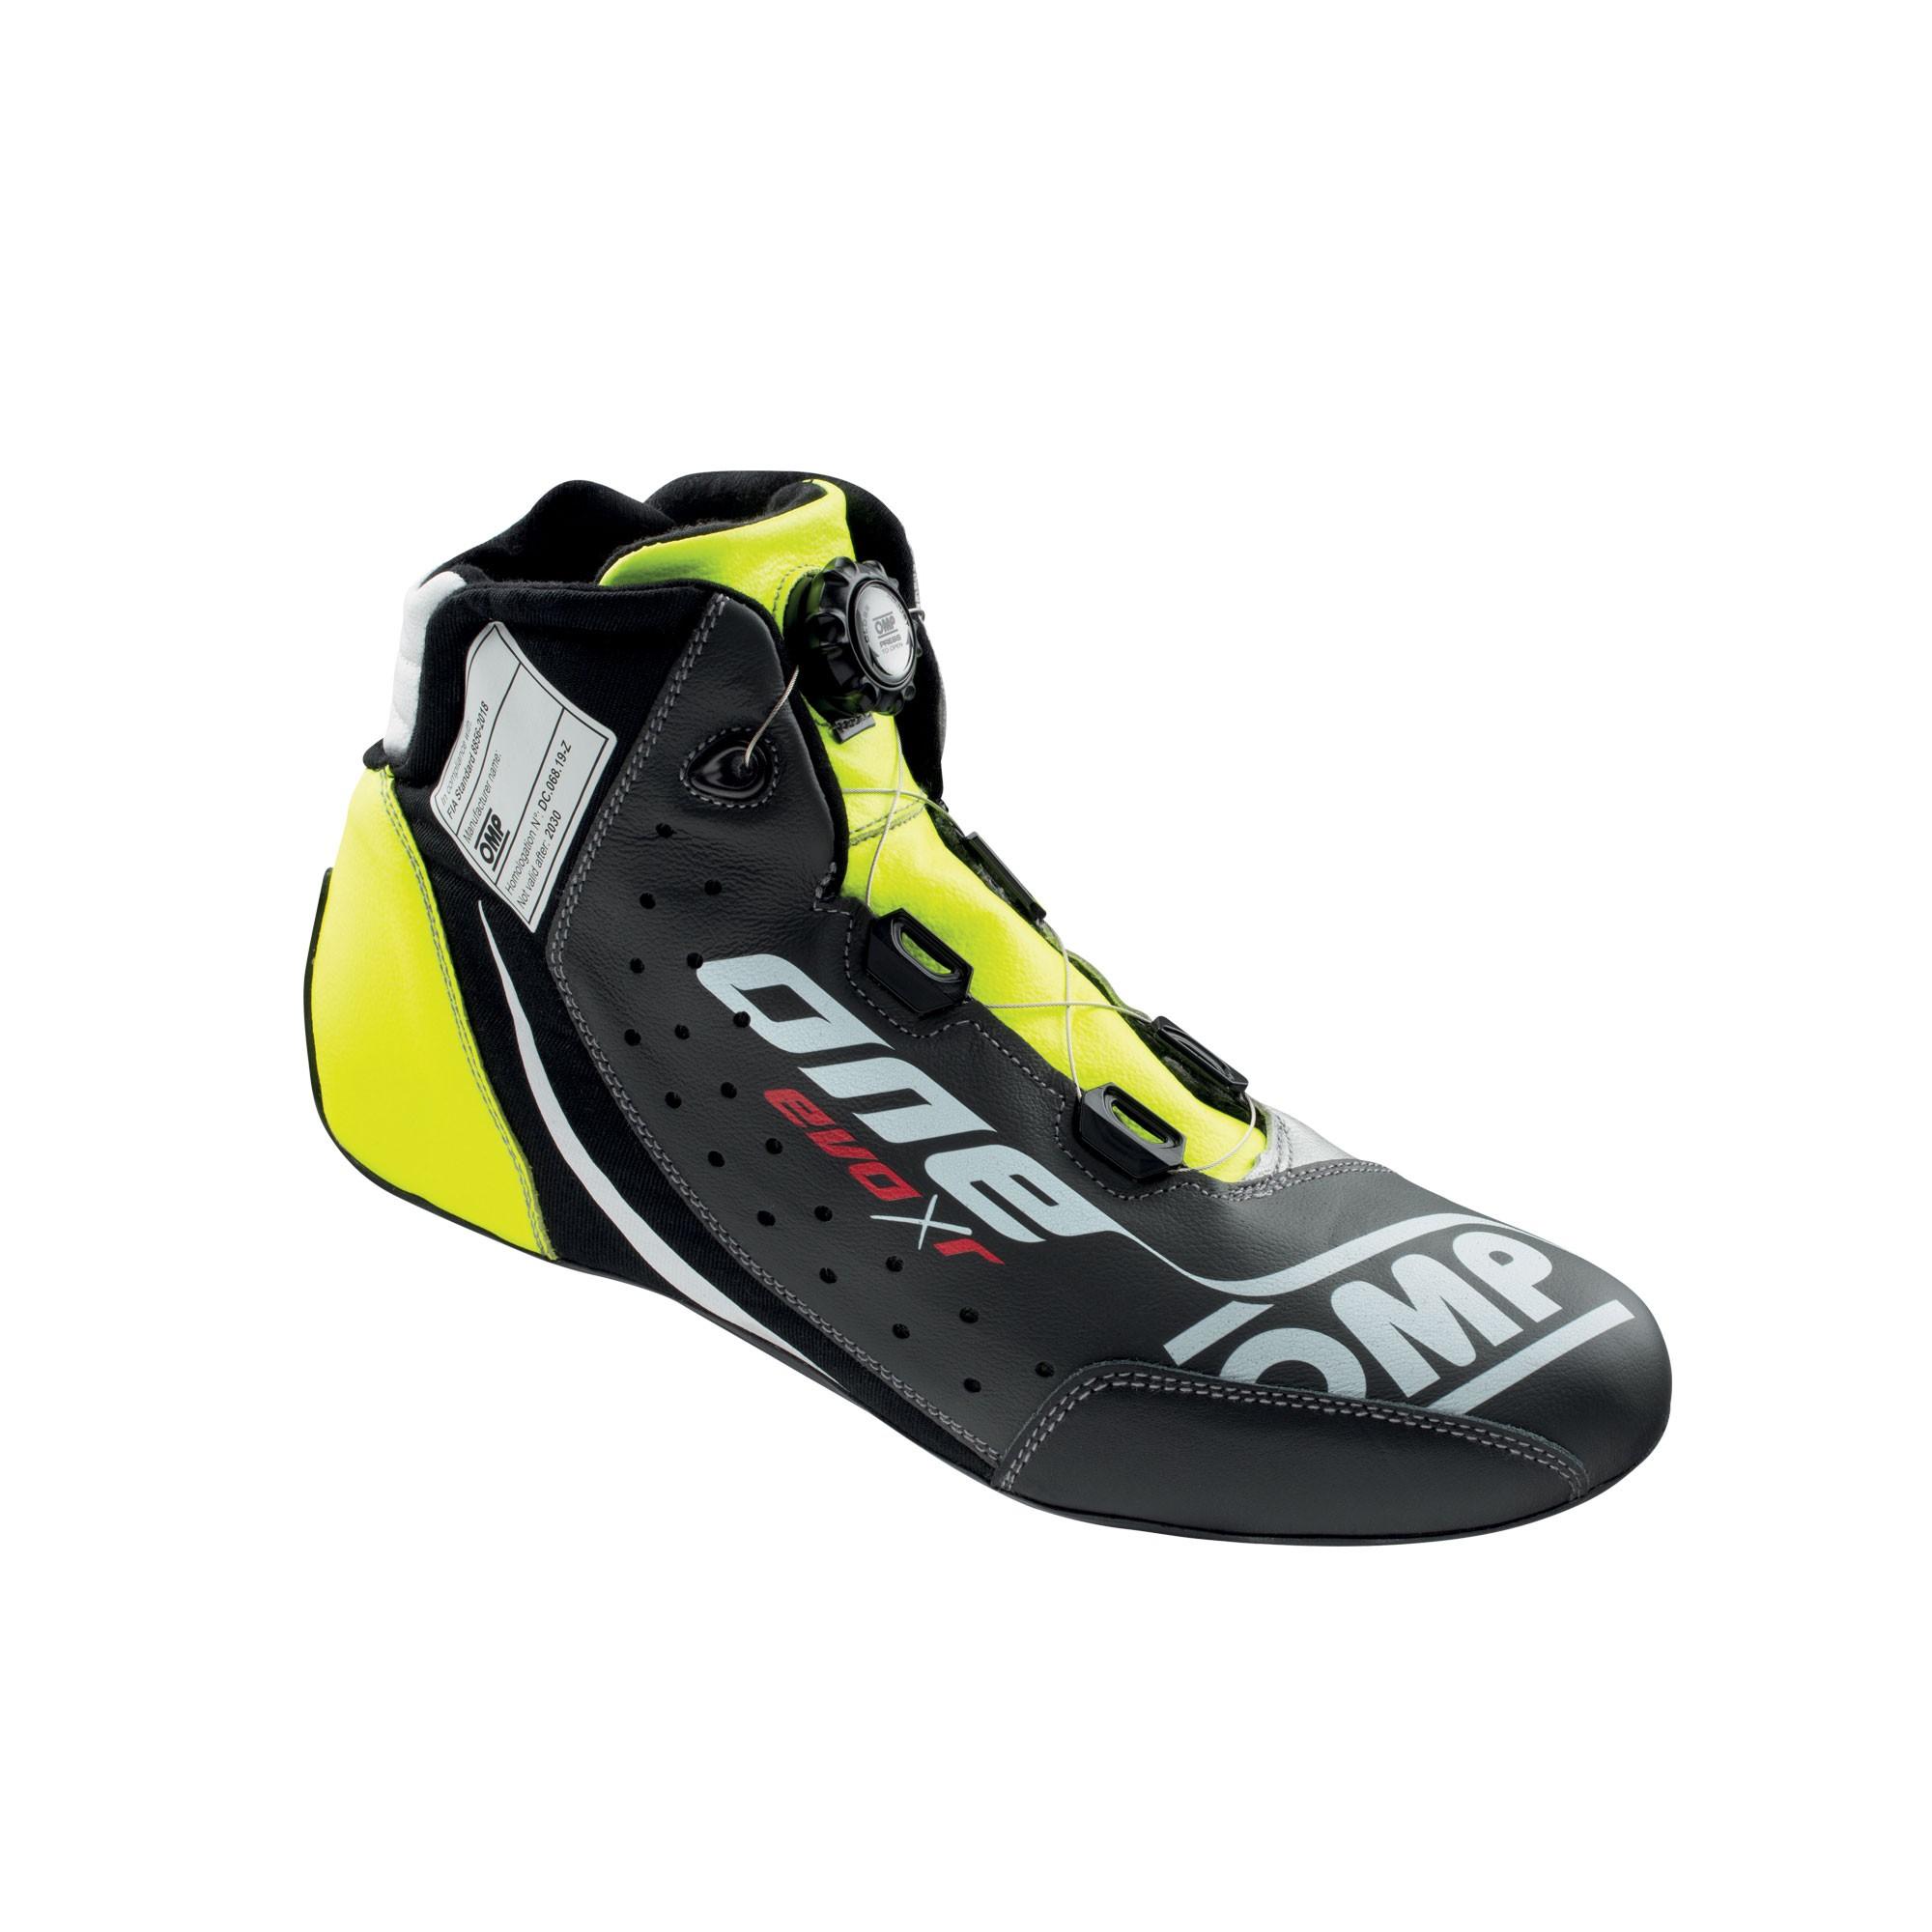 ONE EVO X R Shoes